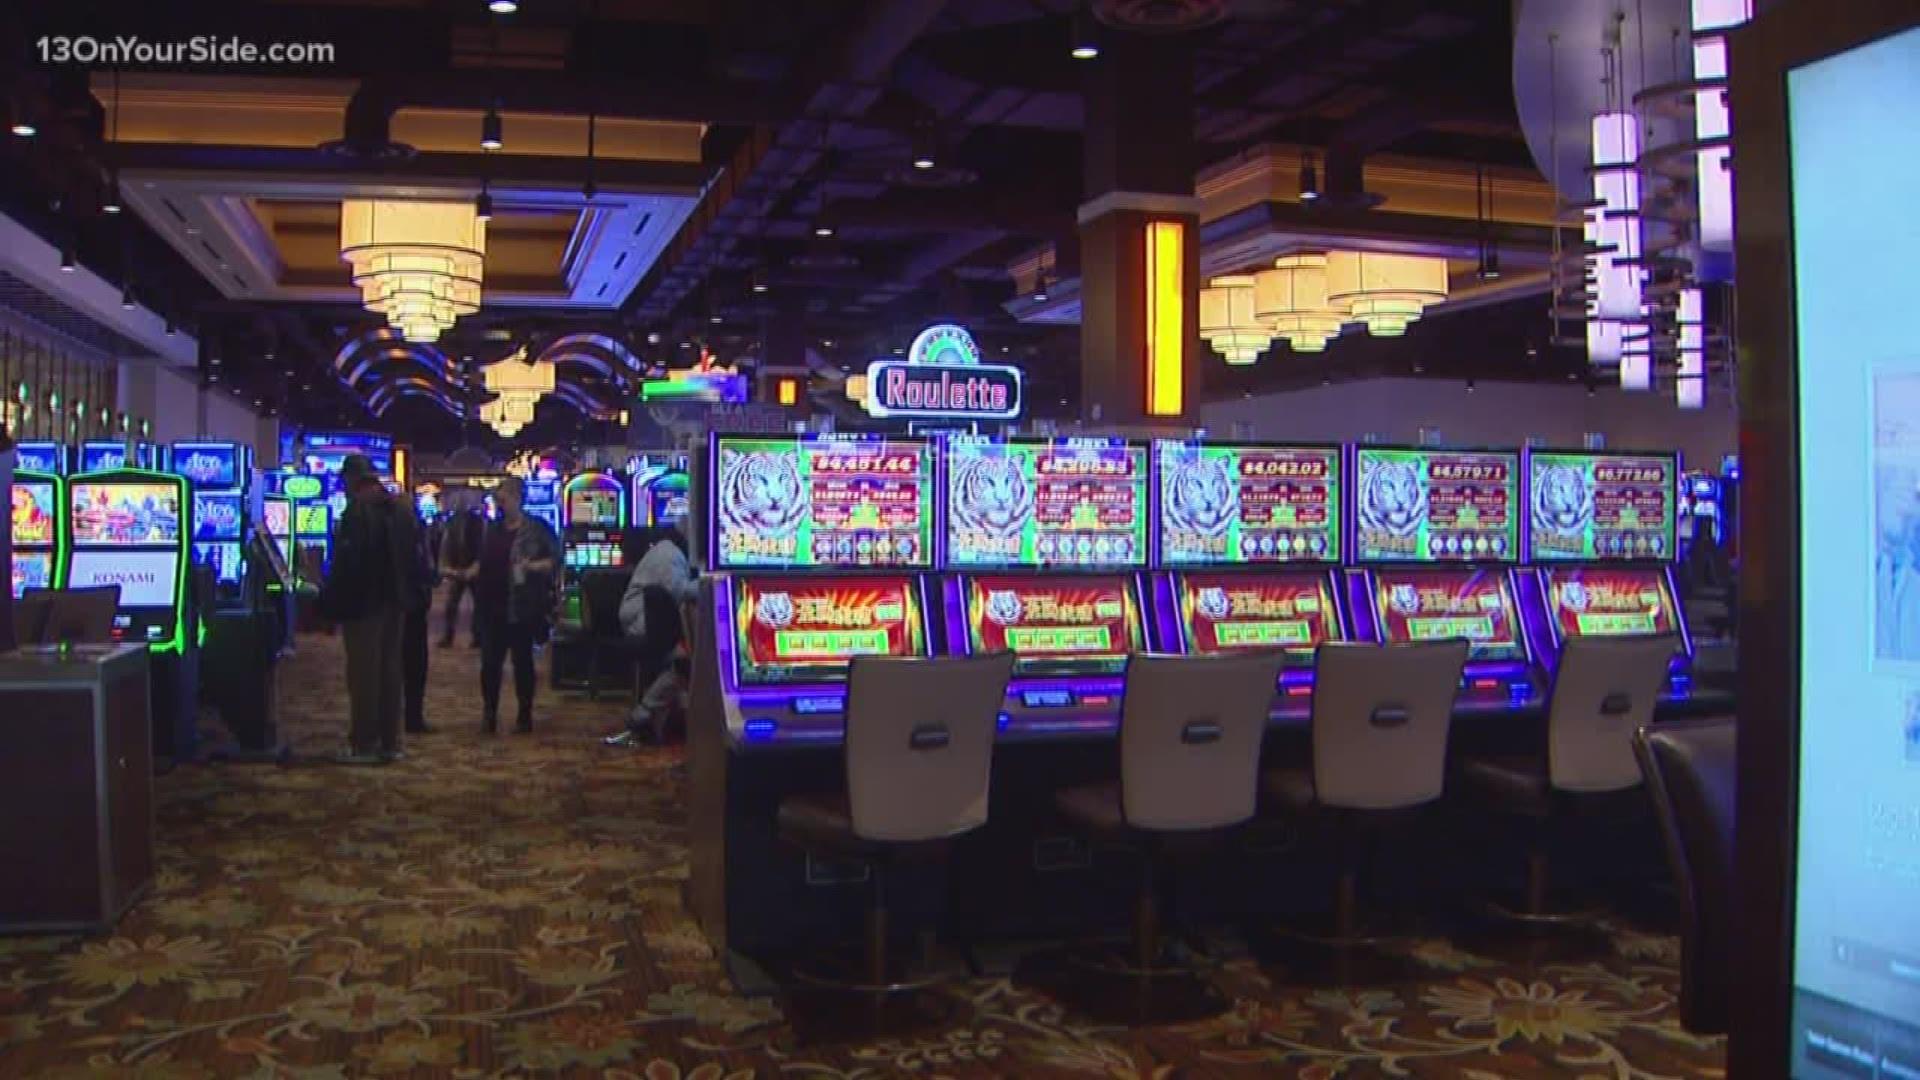 Casinos in michigan under 21 rachelle ferrell soundboard at motorcity casino hotel march 20